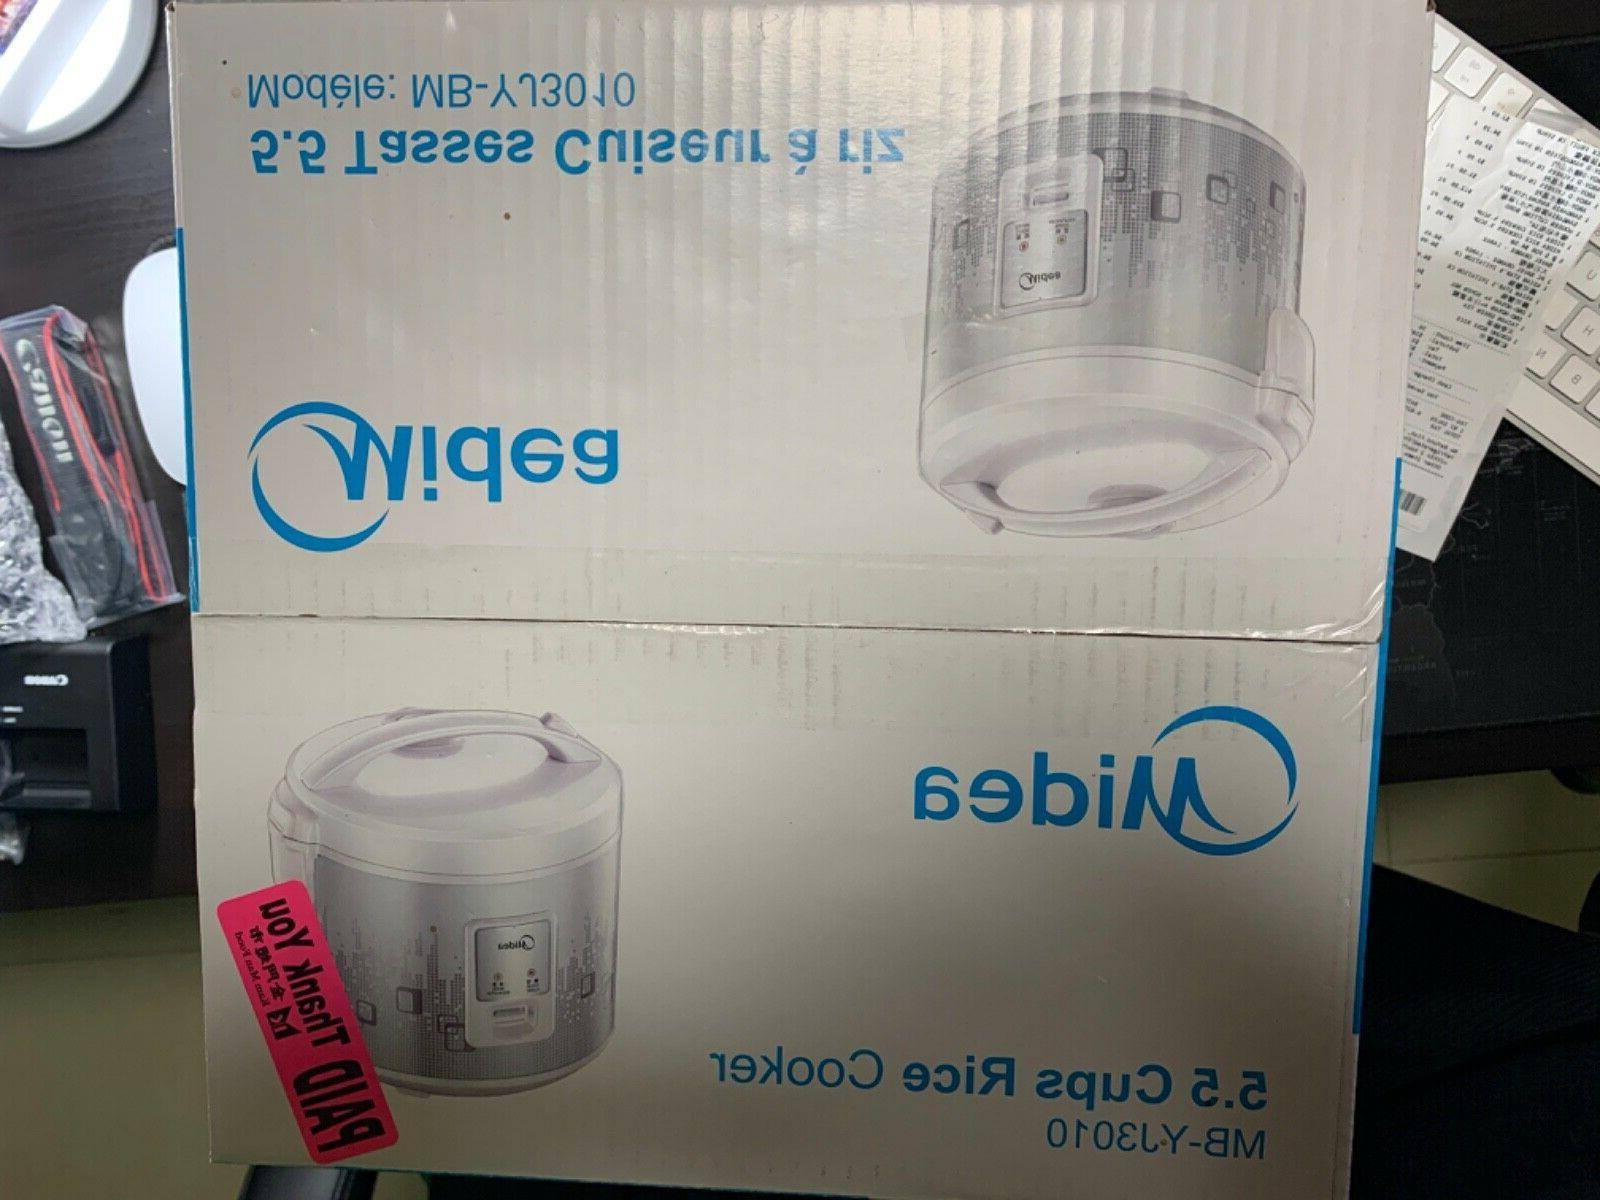 MIDEA Rice 5.5 MB-YJ3010